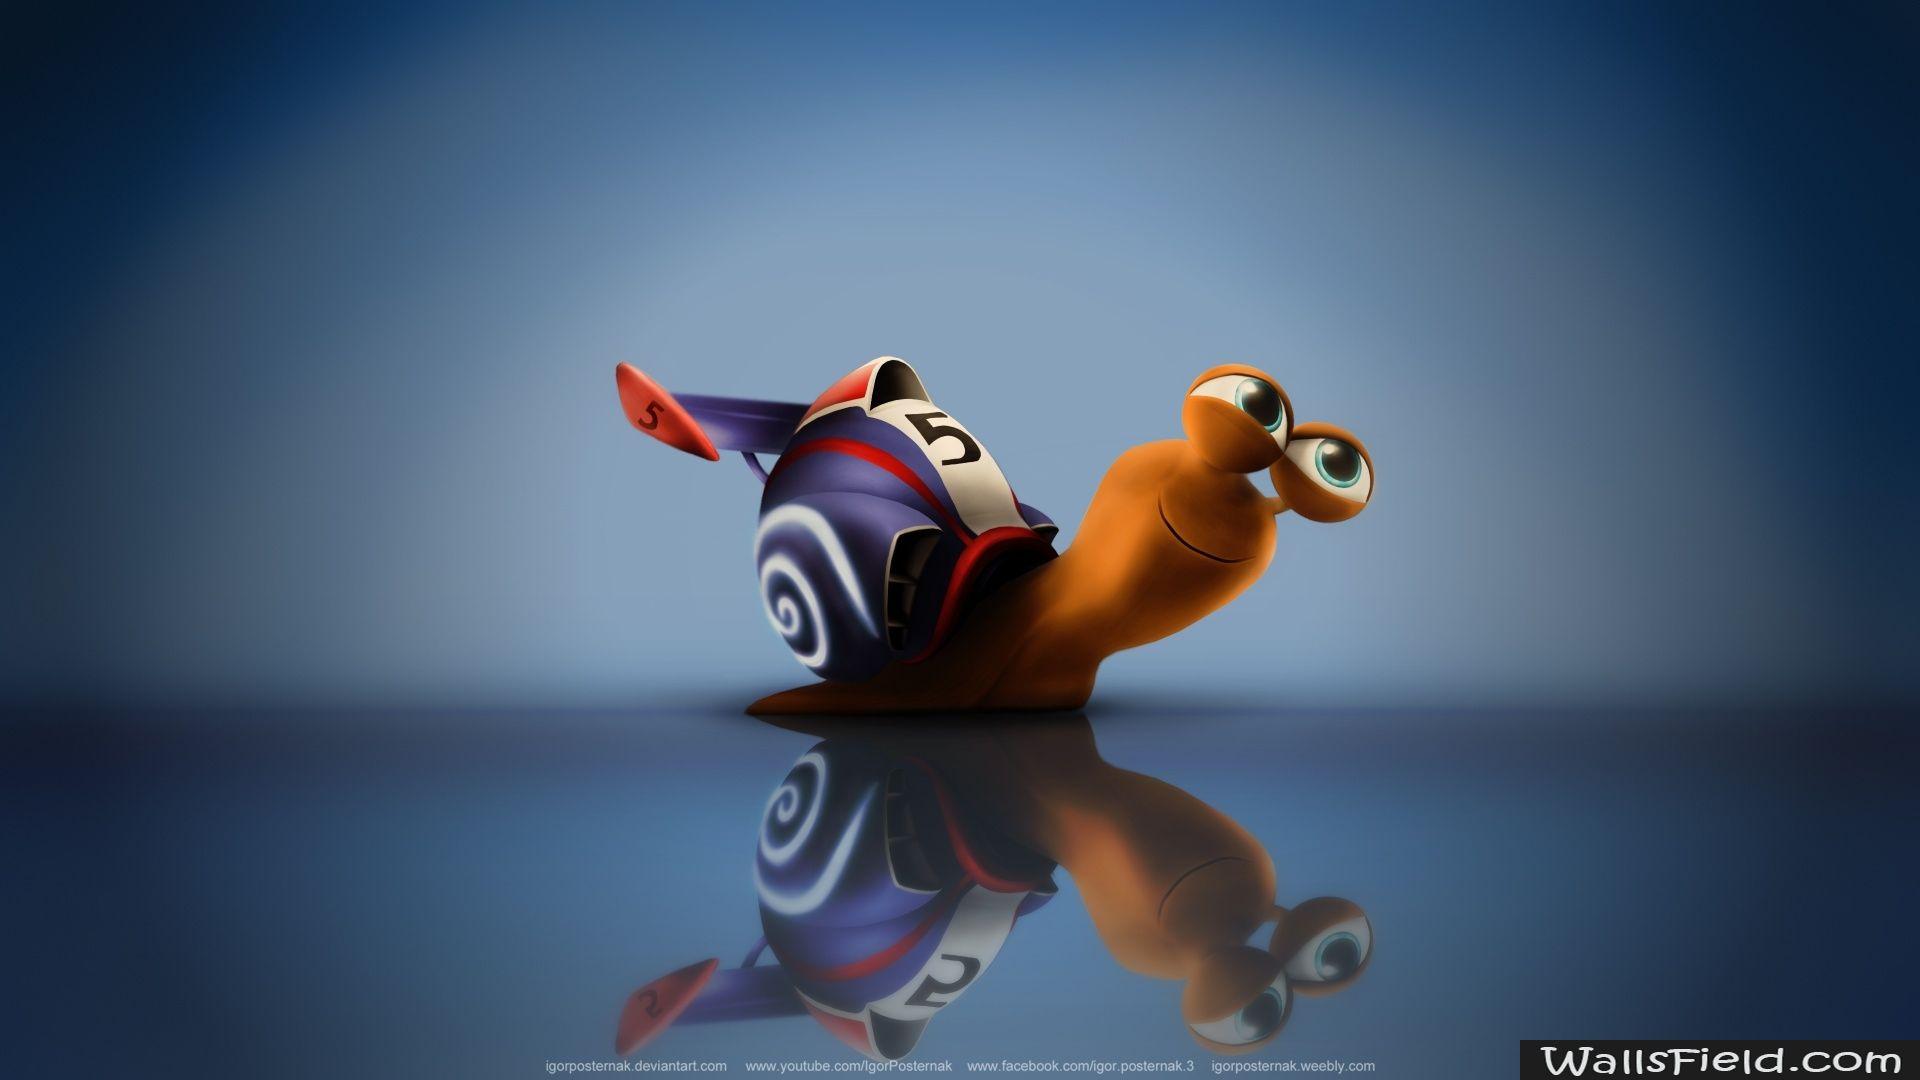 Turbo Wallpaper Sinema Animasyon Animasyon Filmler